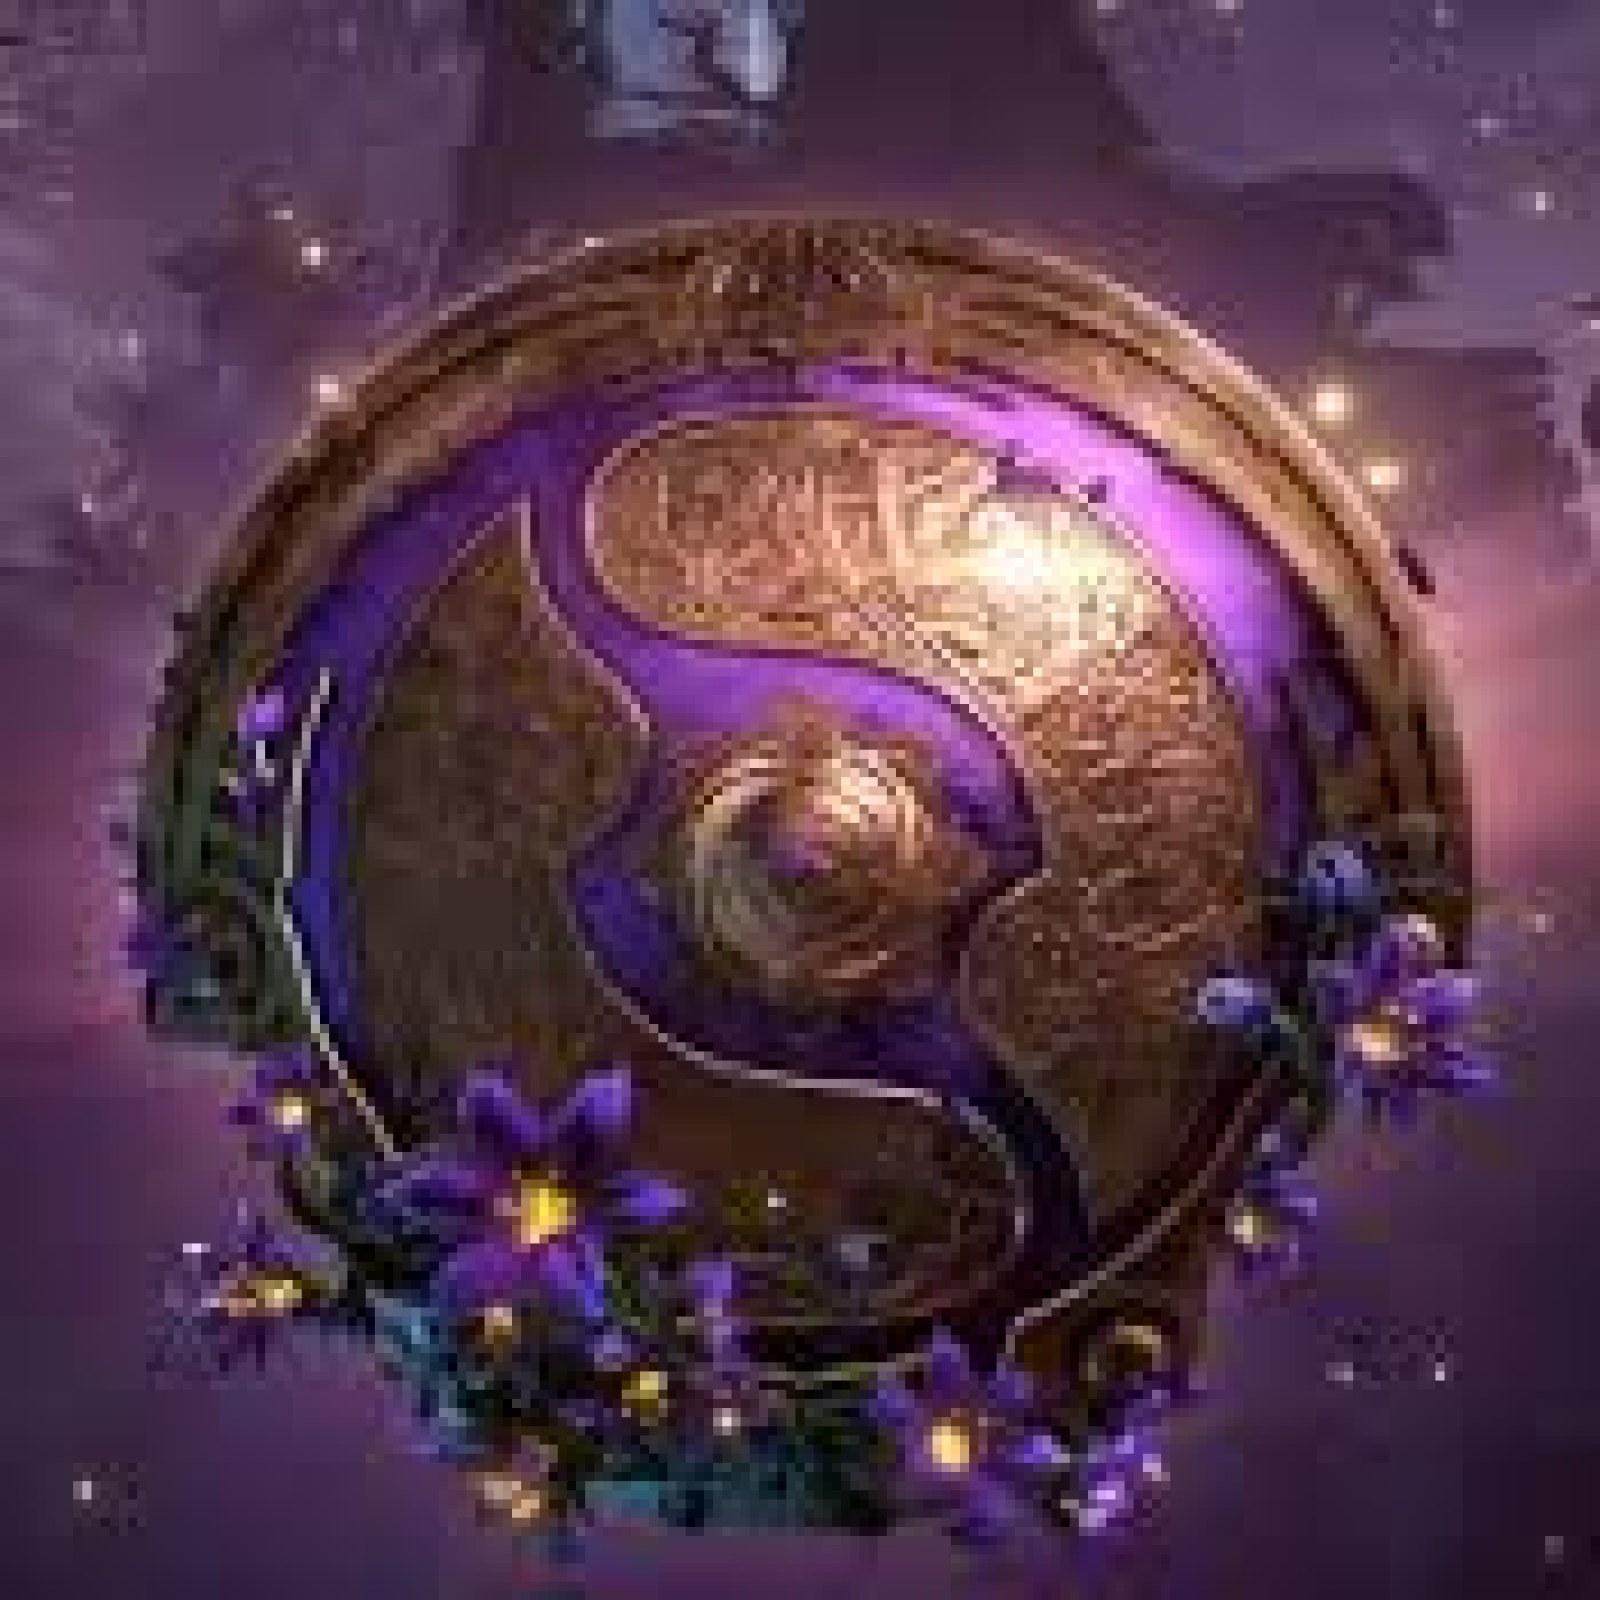 DOTA 2' 2019 Compendium and Battle Pass Revealed: Unlock